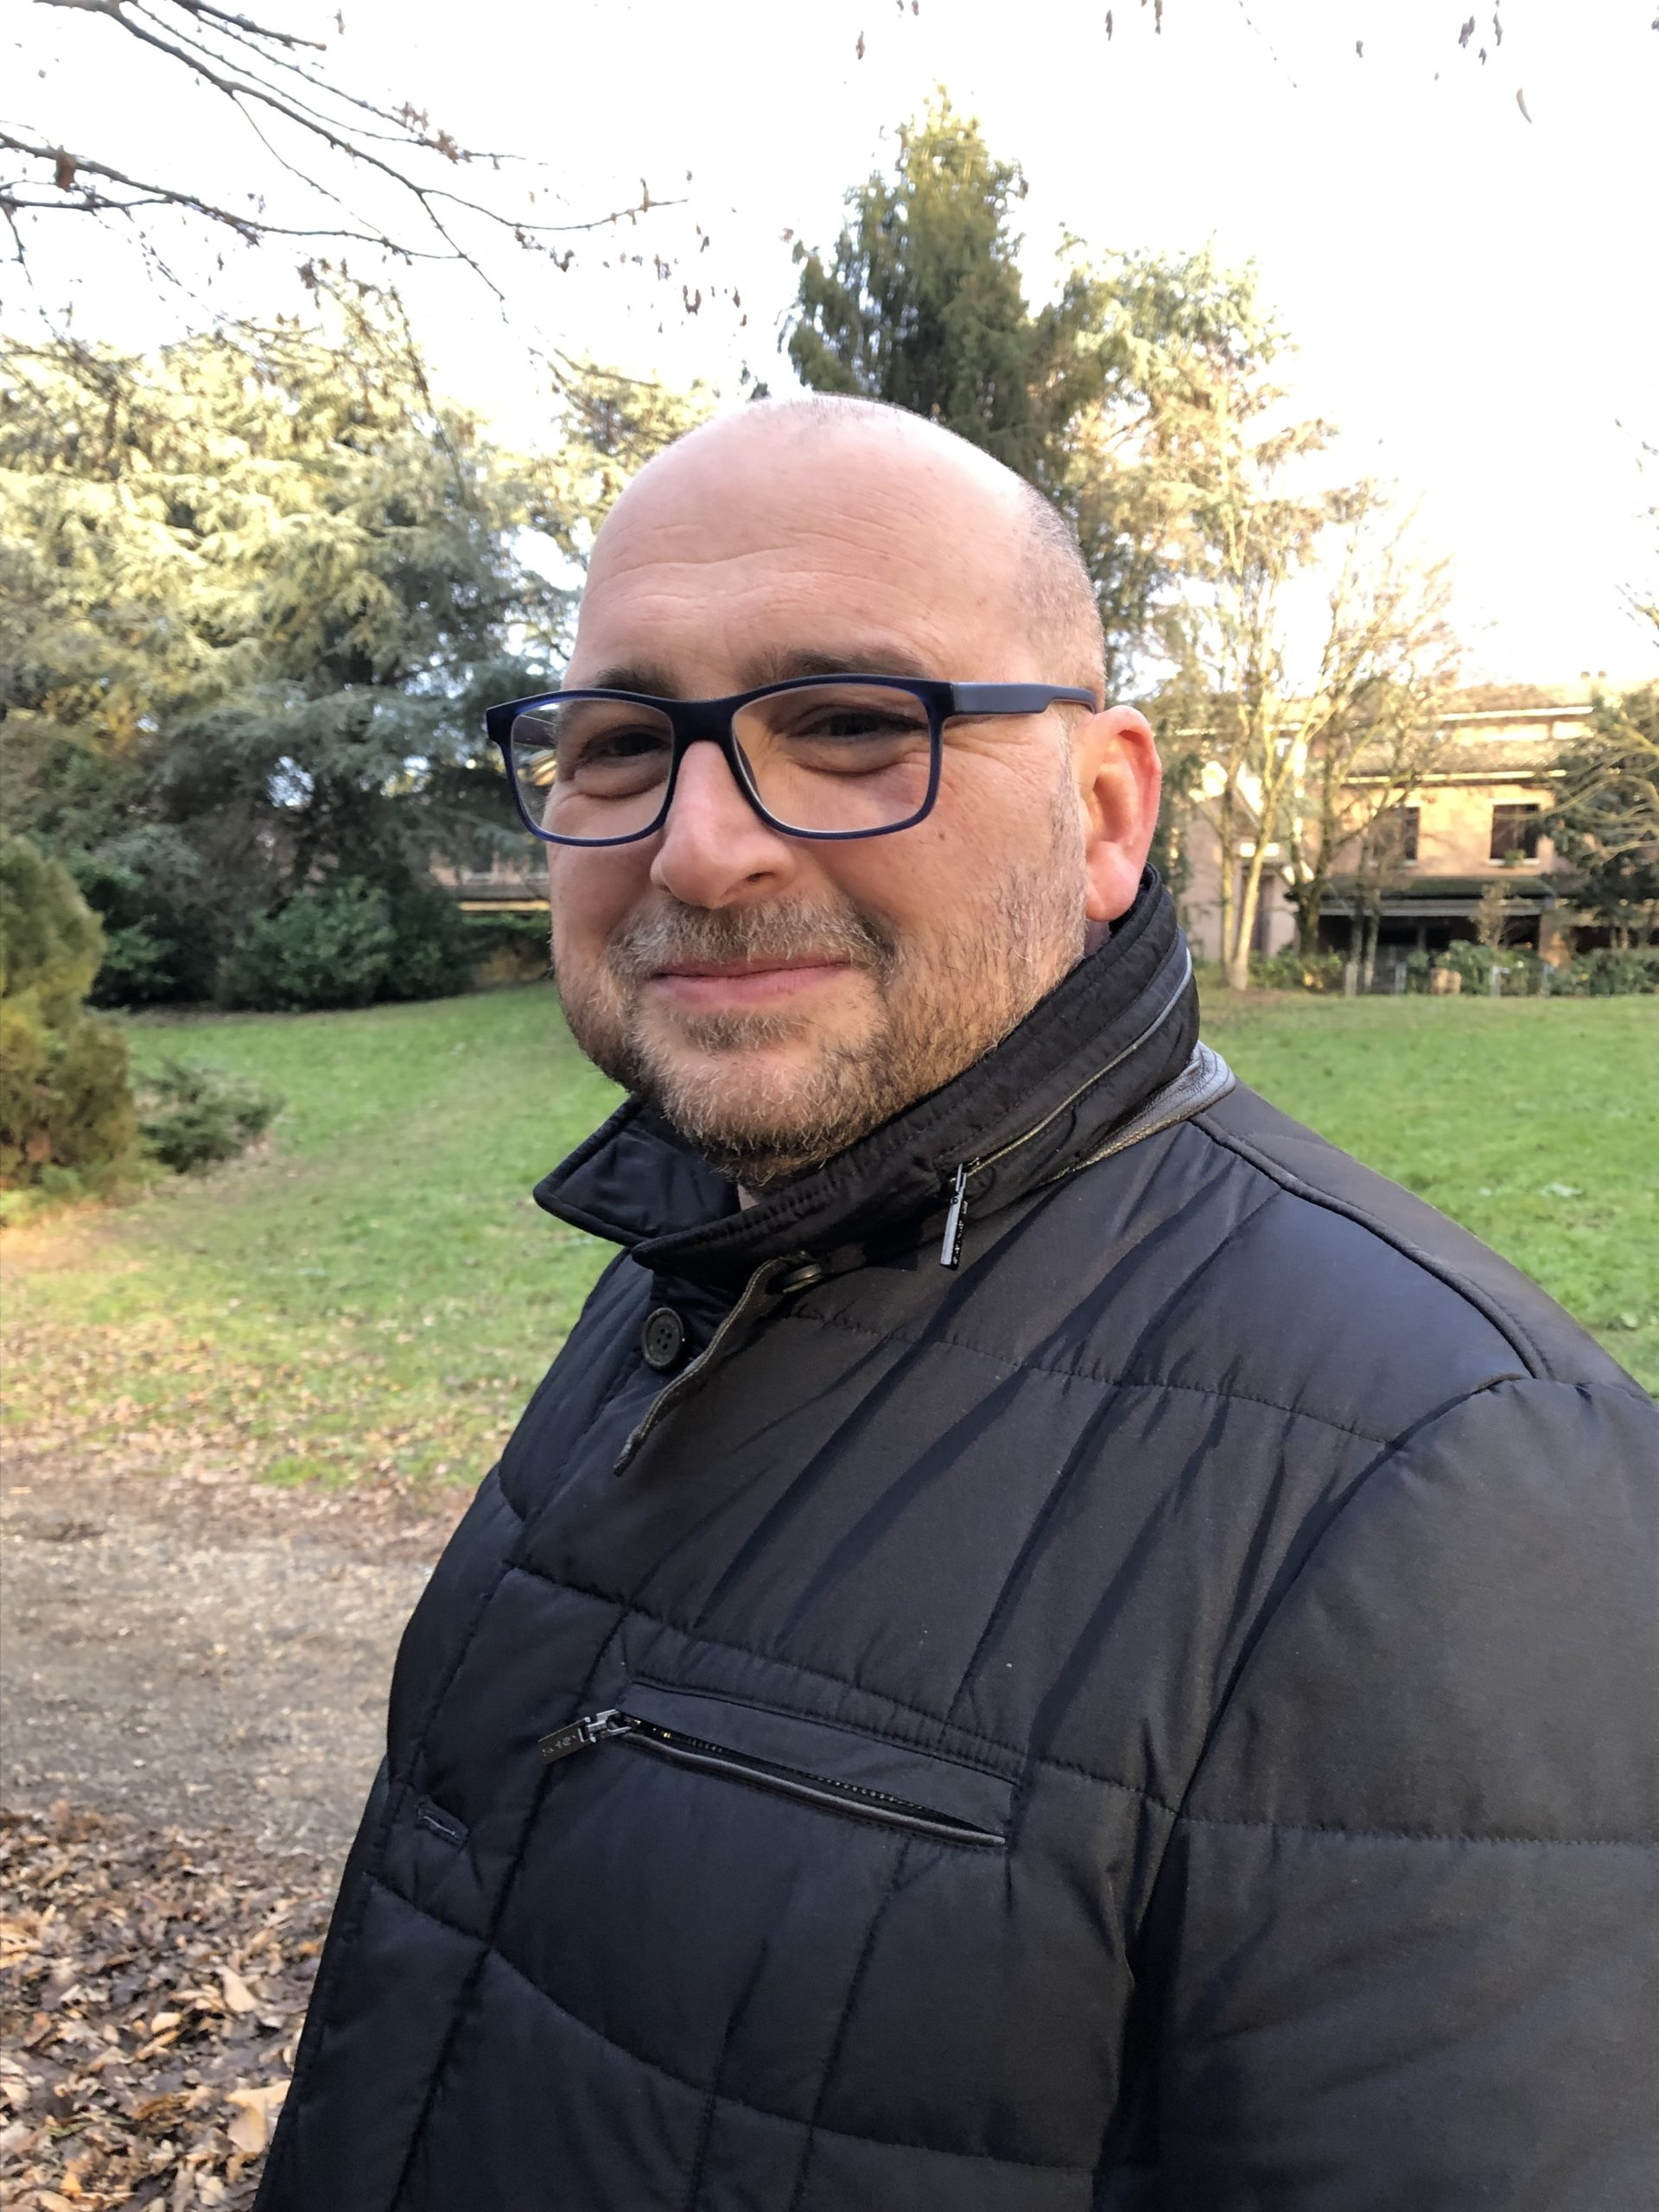 Gianluca Iori